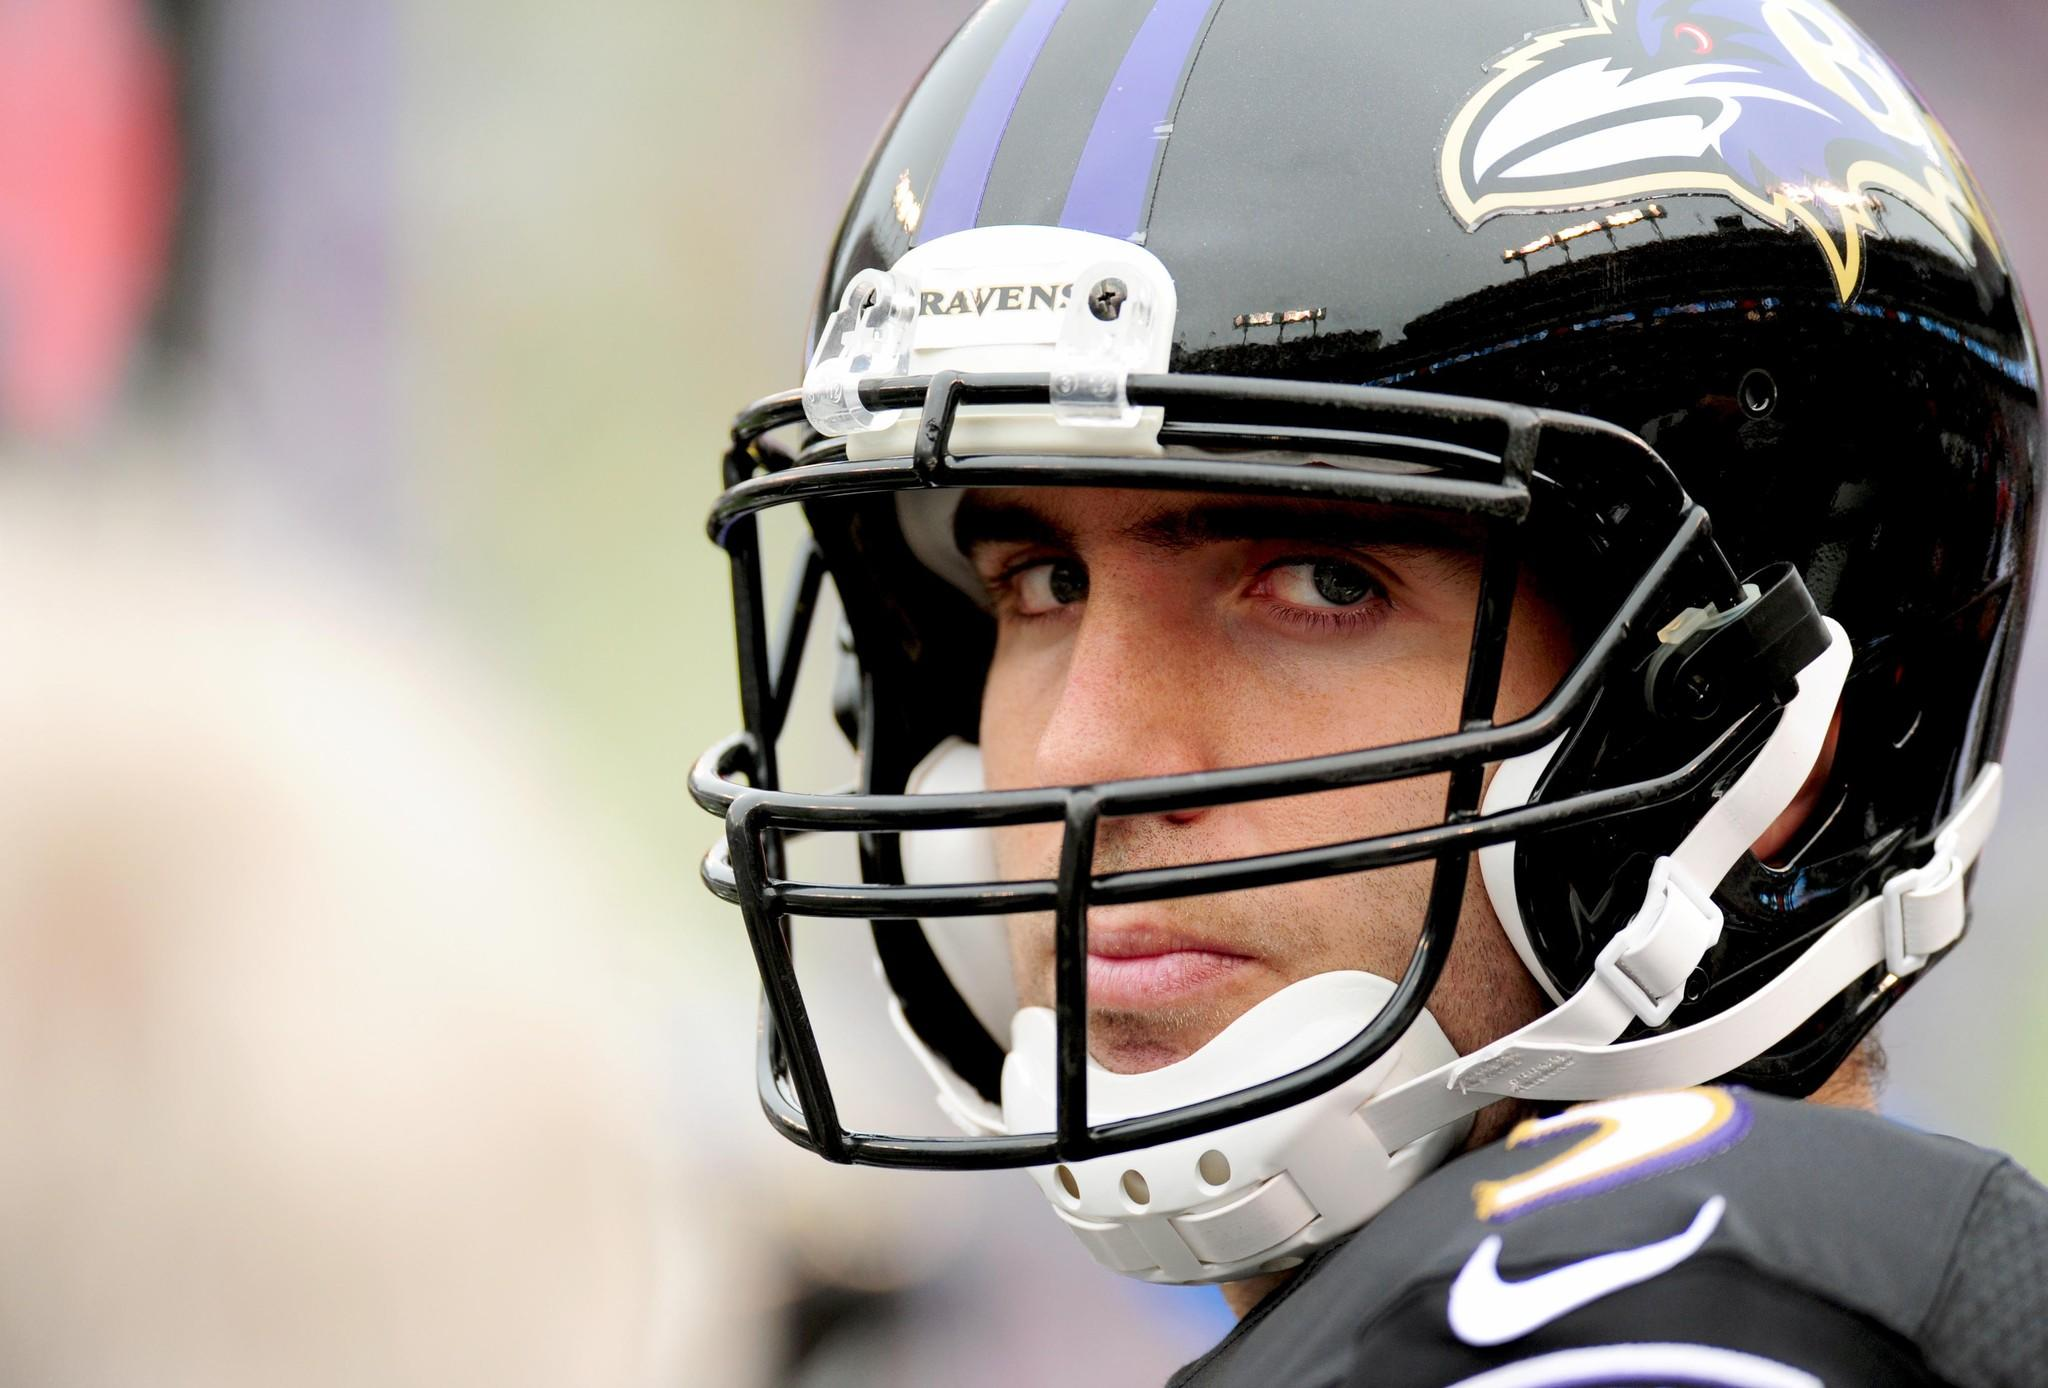 Only five NFL quarterbacks had a worse accuracy percentage than Joe Flacco in 2013.